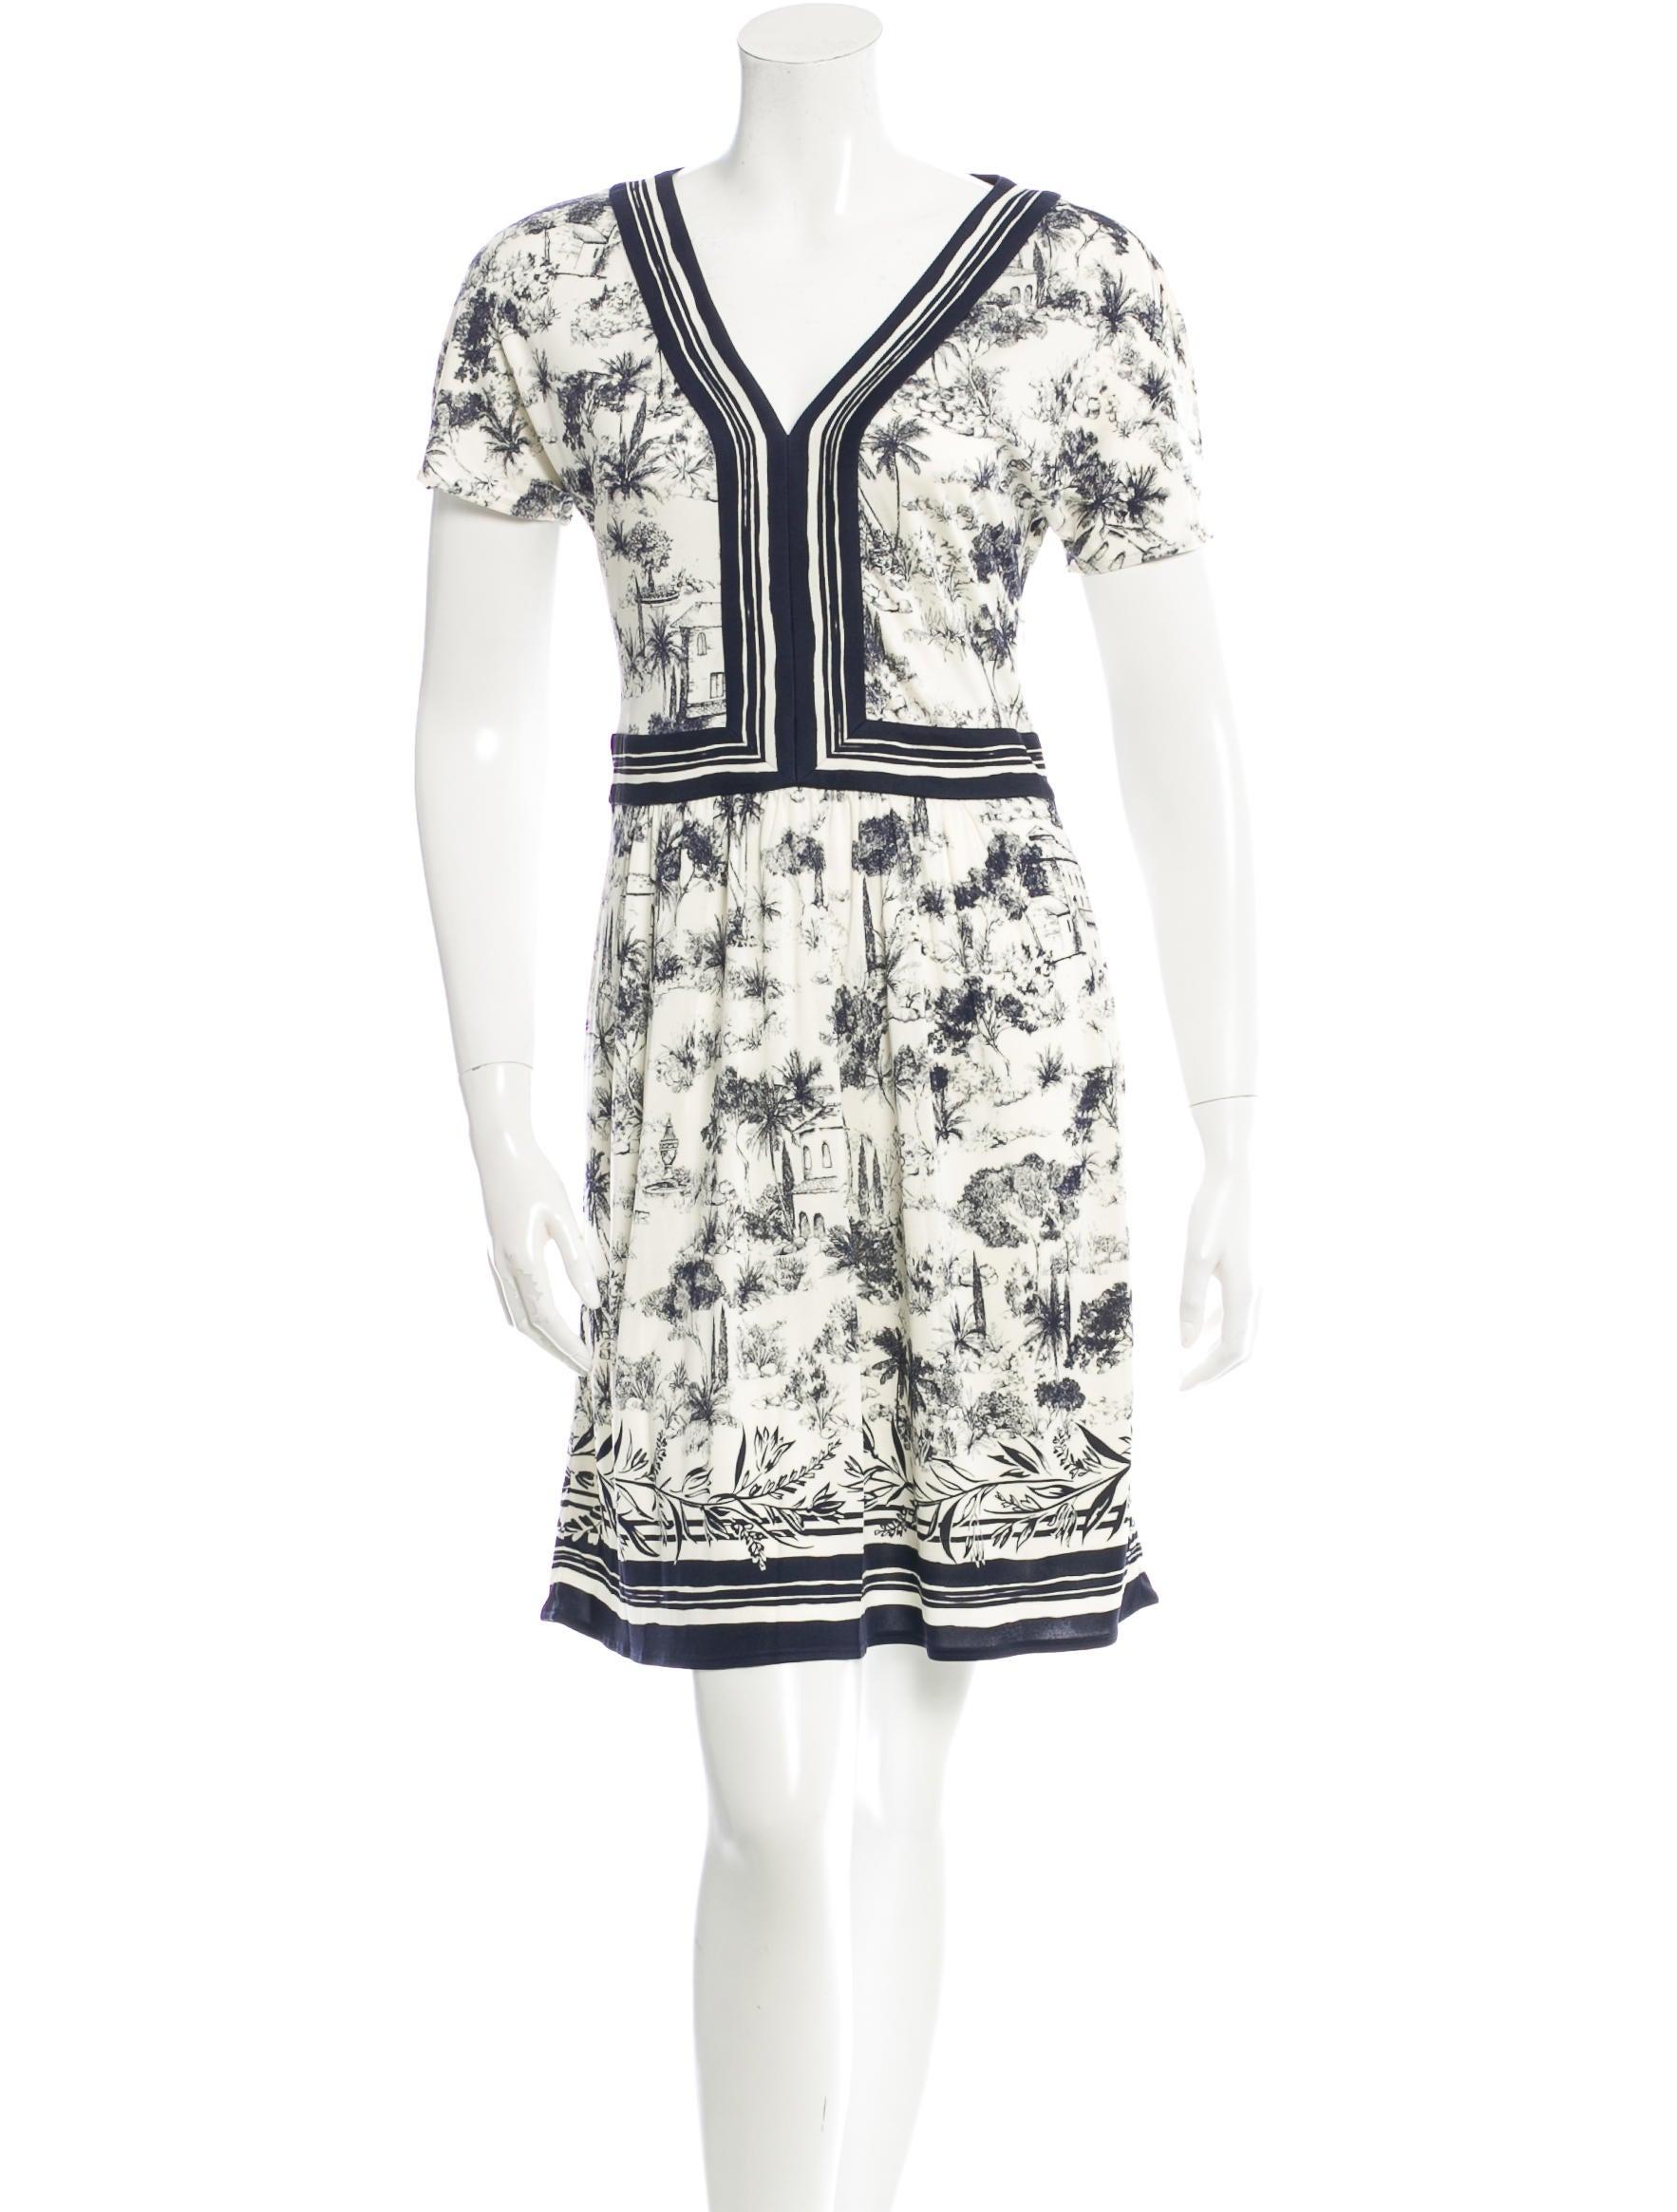 Tory Burch Toile Du Jouy Print Dress Clothing Wto53236